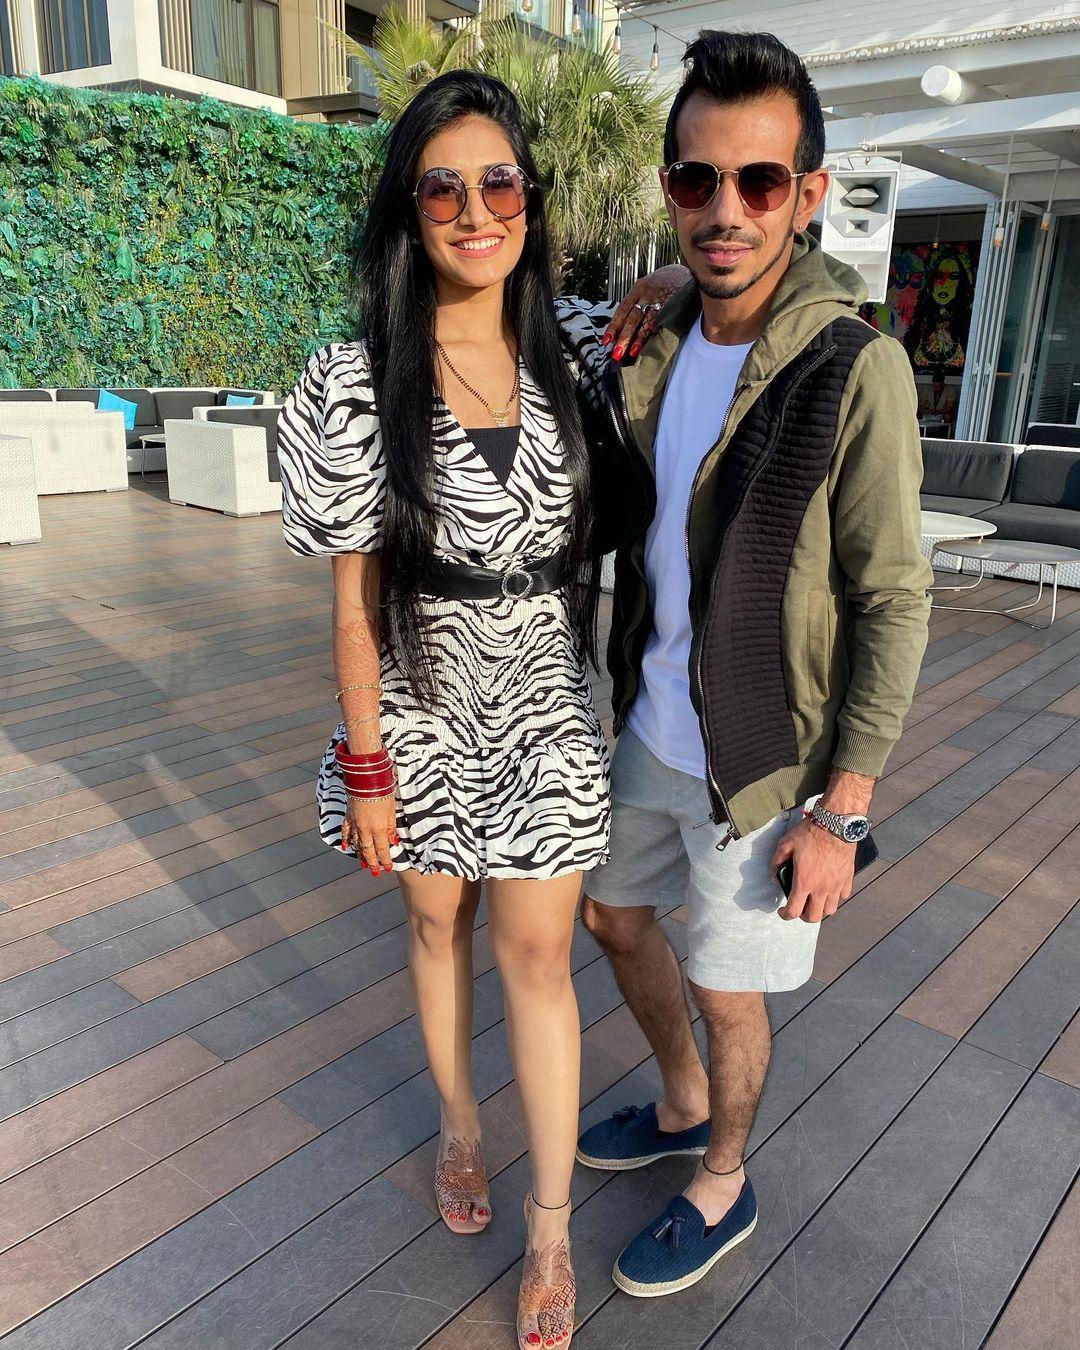 Chahal and Dhanashree are honeymooning in Dubai | Instagram